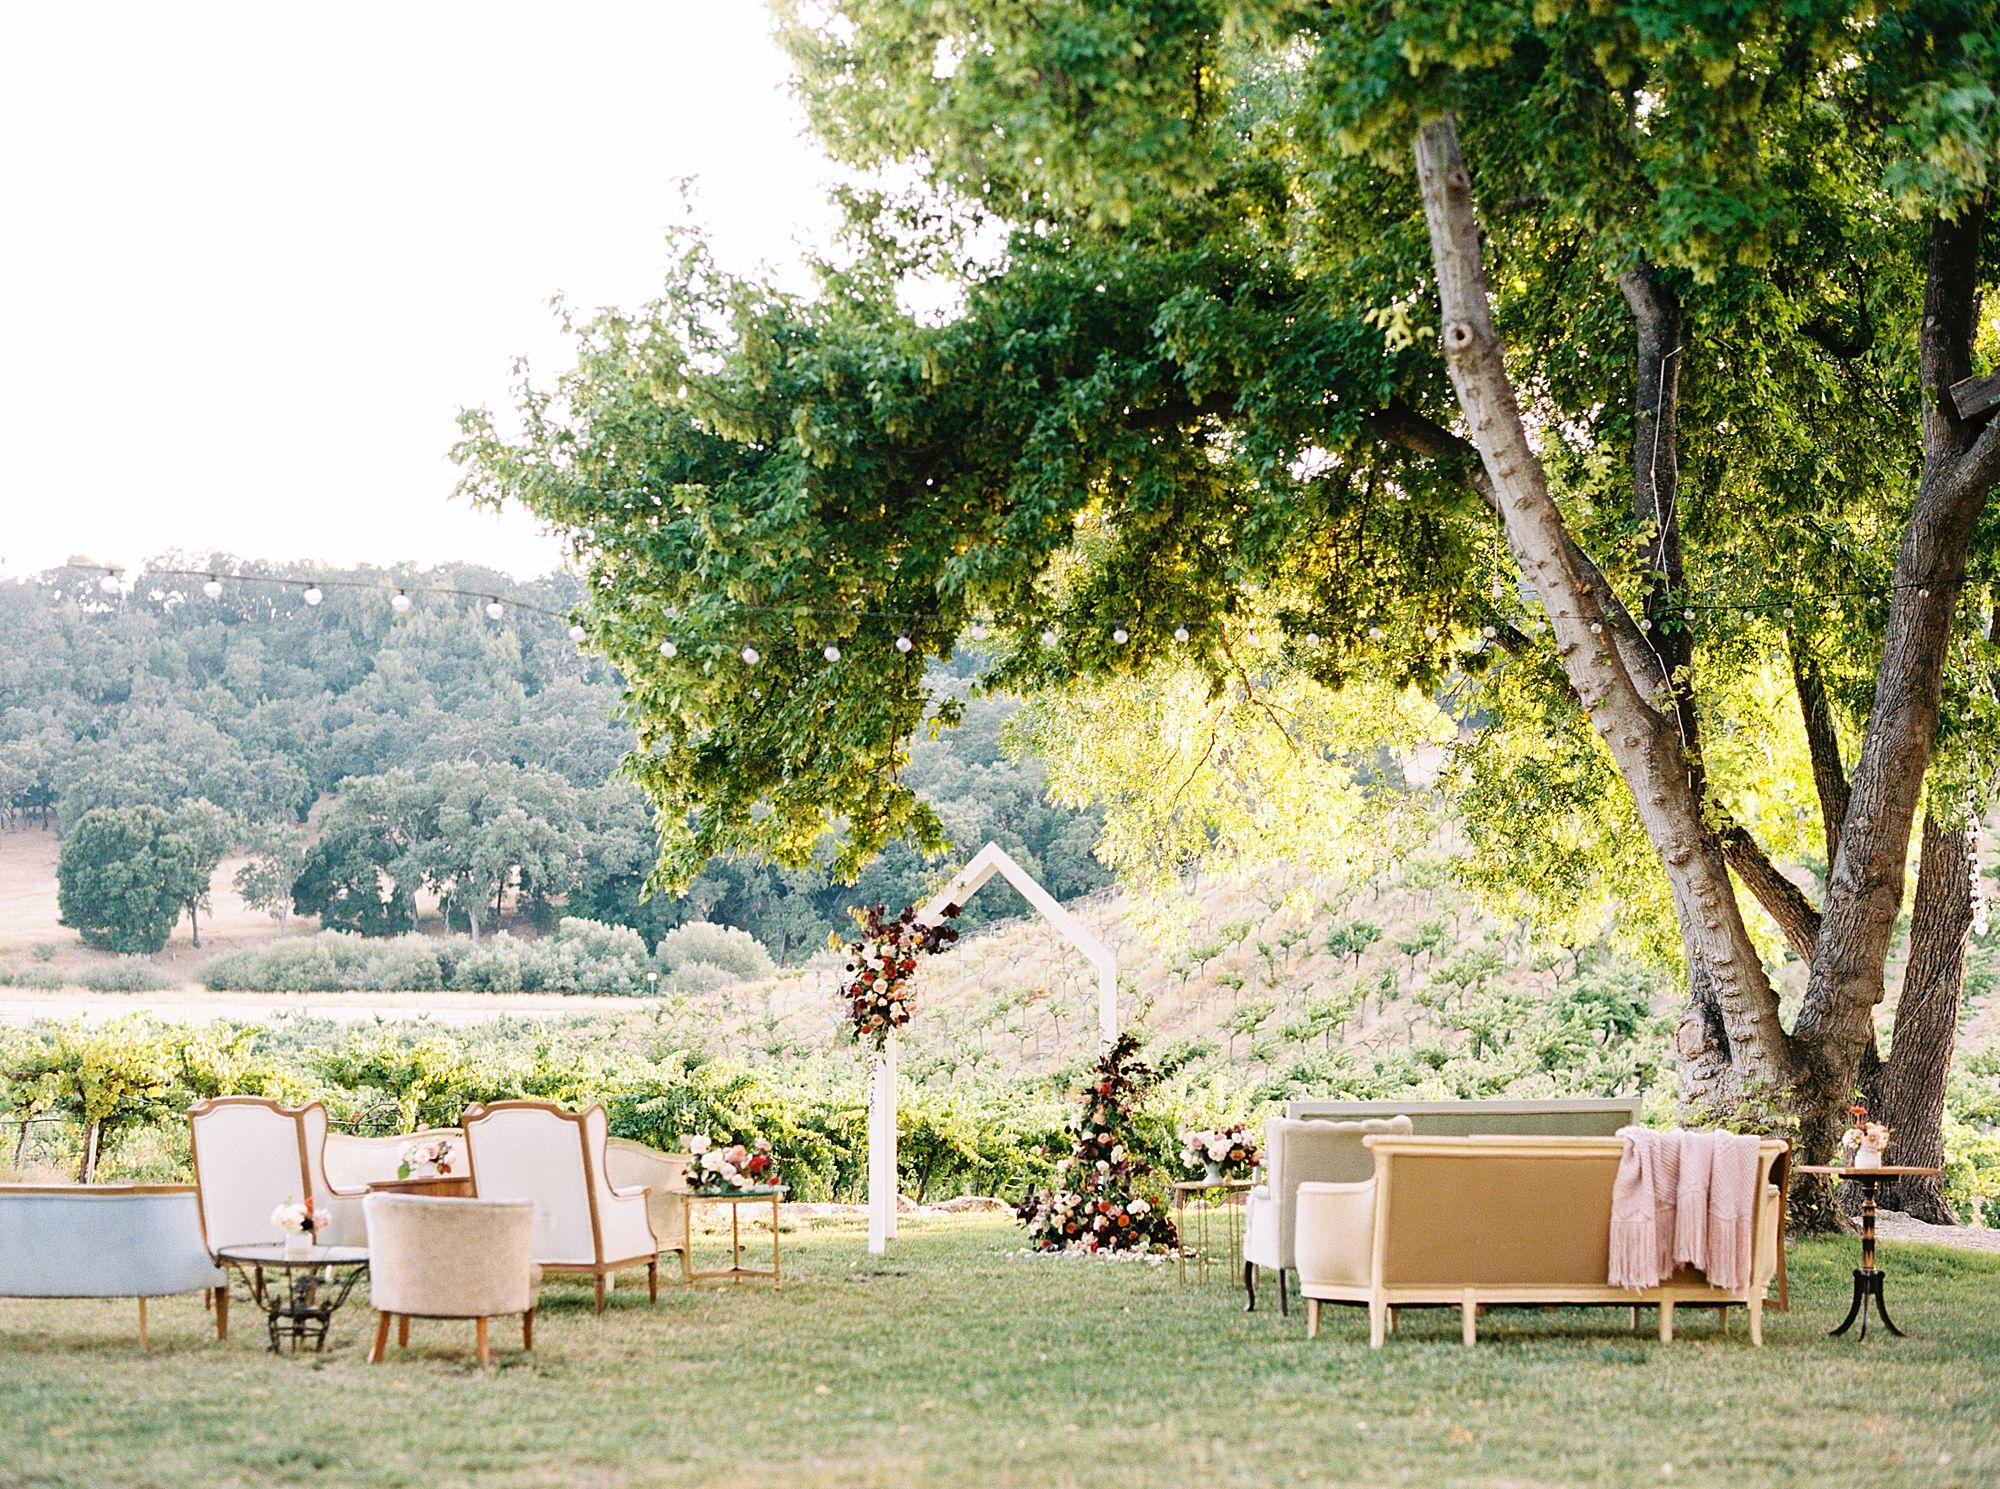 HammerSky Wedding Inspiration Featured on Hey Wedding Lady with Vanessa Noel Events - Ashley Baumgartner - SLO Wedding Photographer_0014.jpg